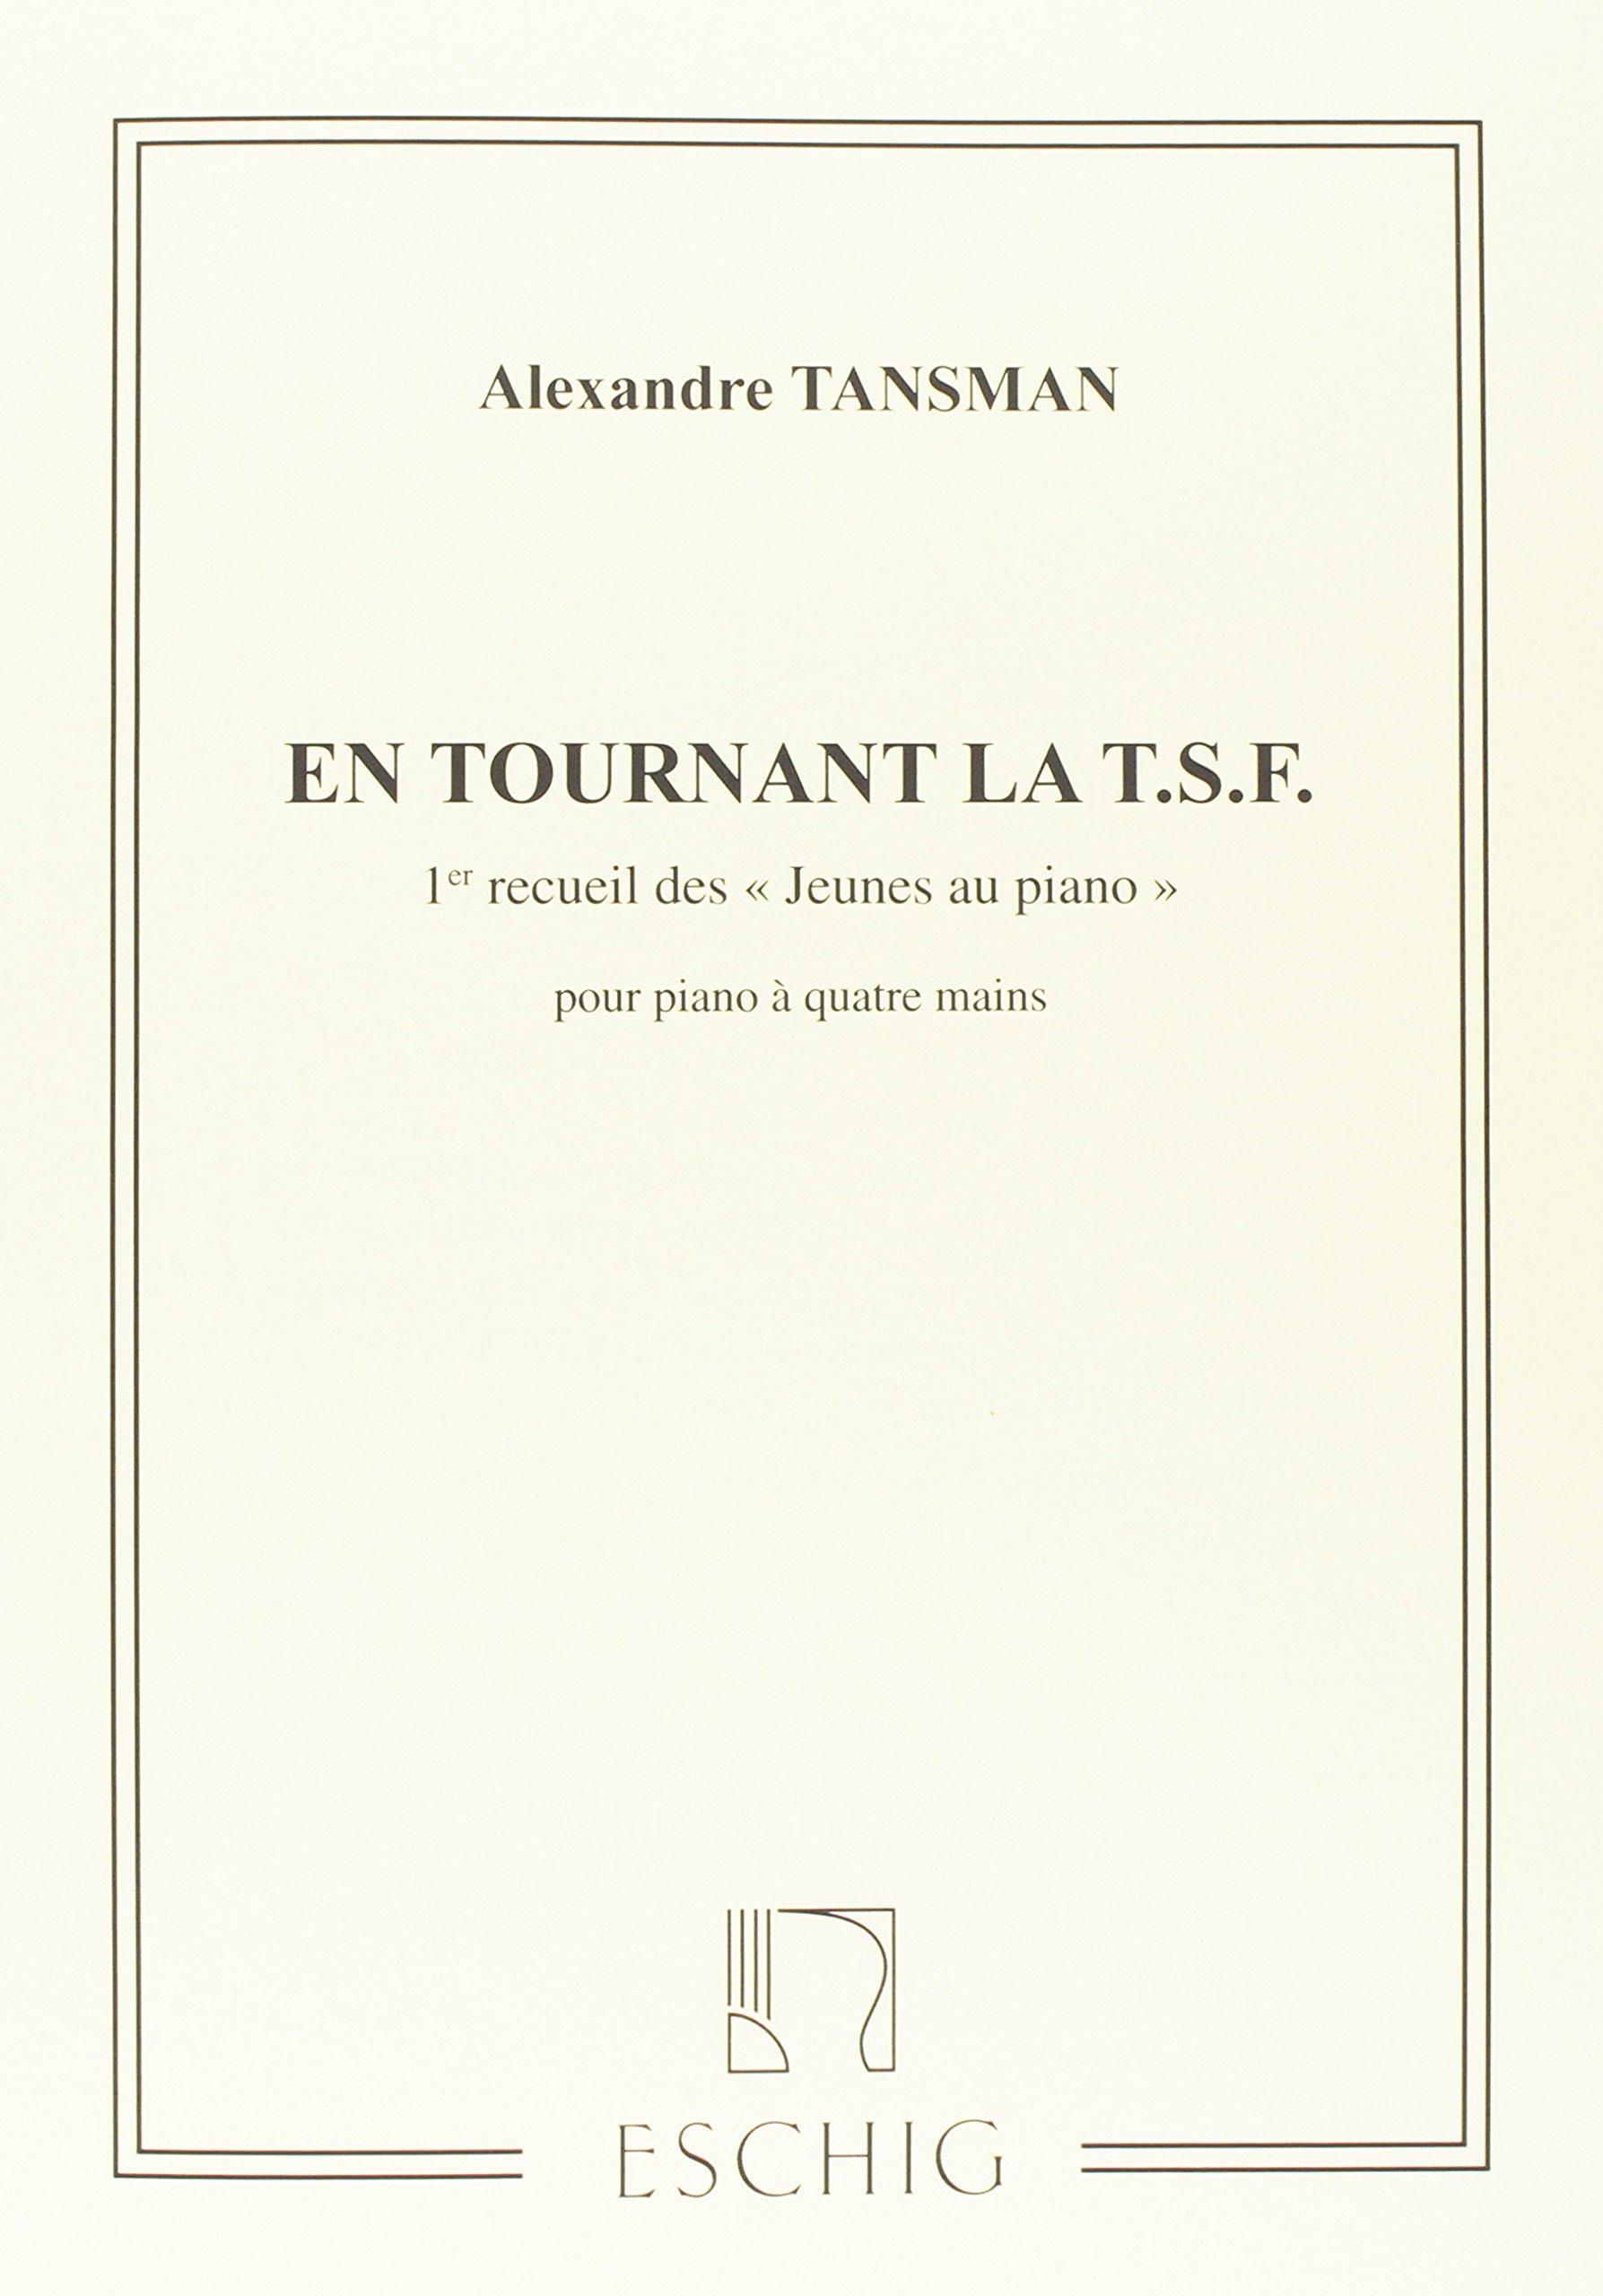 Jeunes Au Piano Vol 1 4 Ms (En Tournant La Tsf) Copertina flessibile – 1 gen 2001 Alexandre Tansman Max Eschig 0045025495 Musique - danse